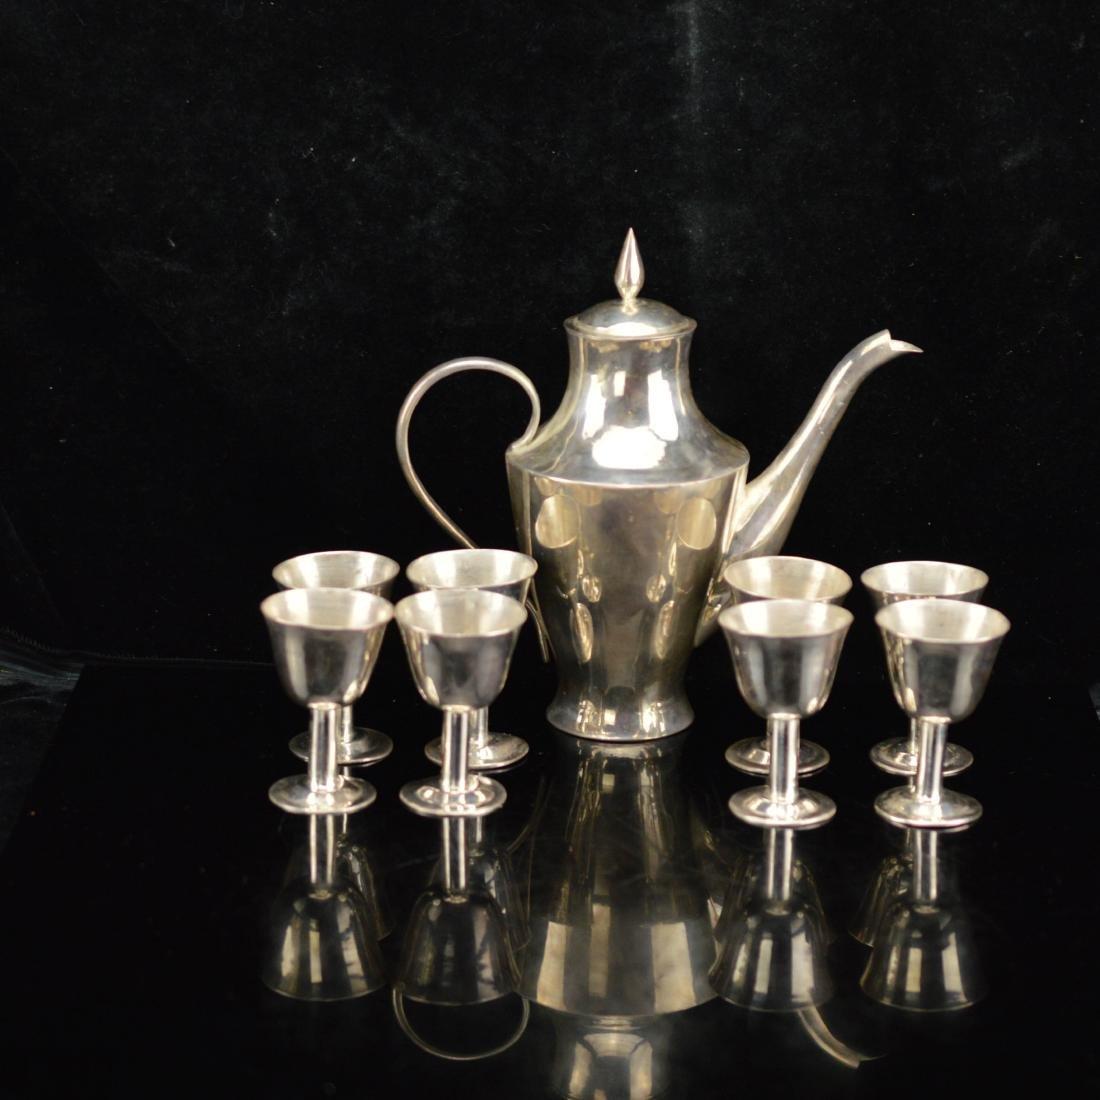 Set of silverware